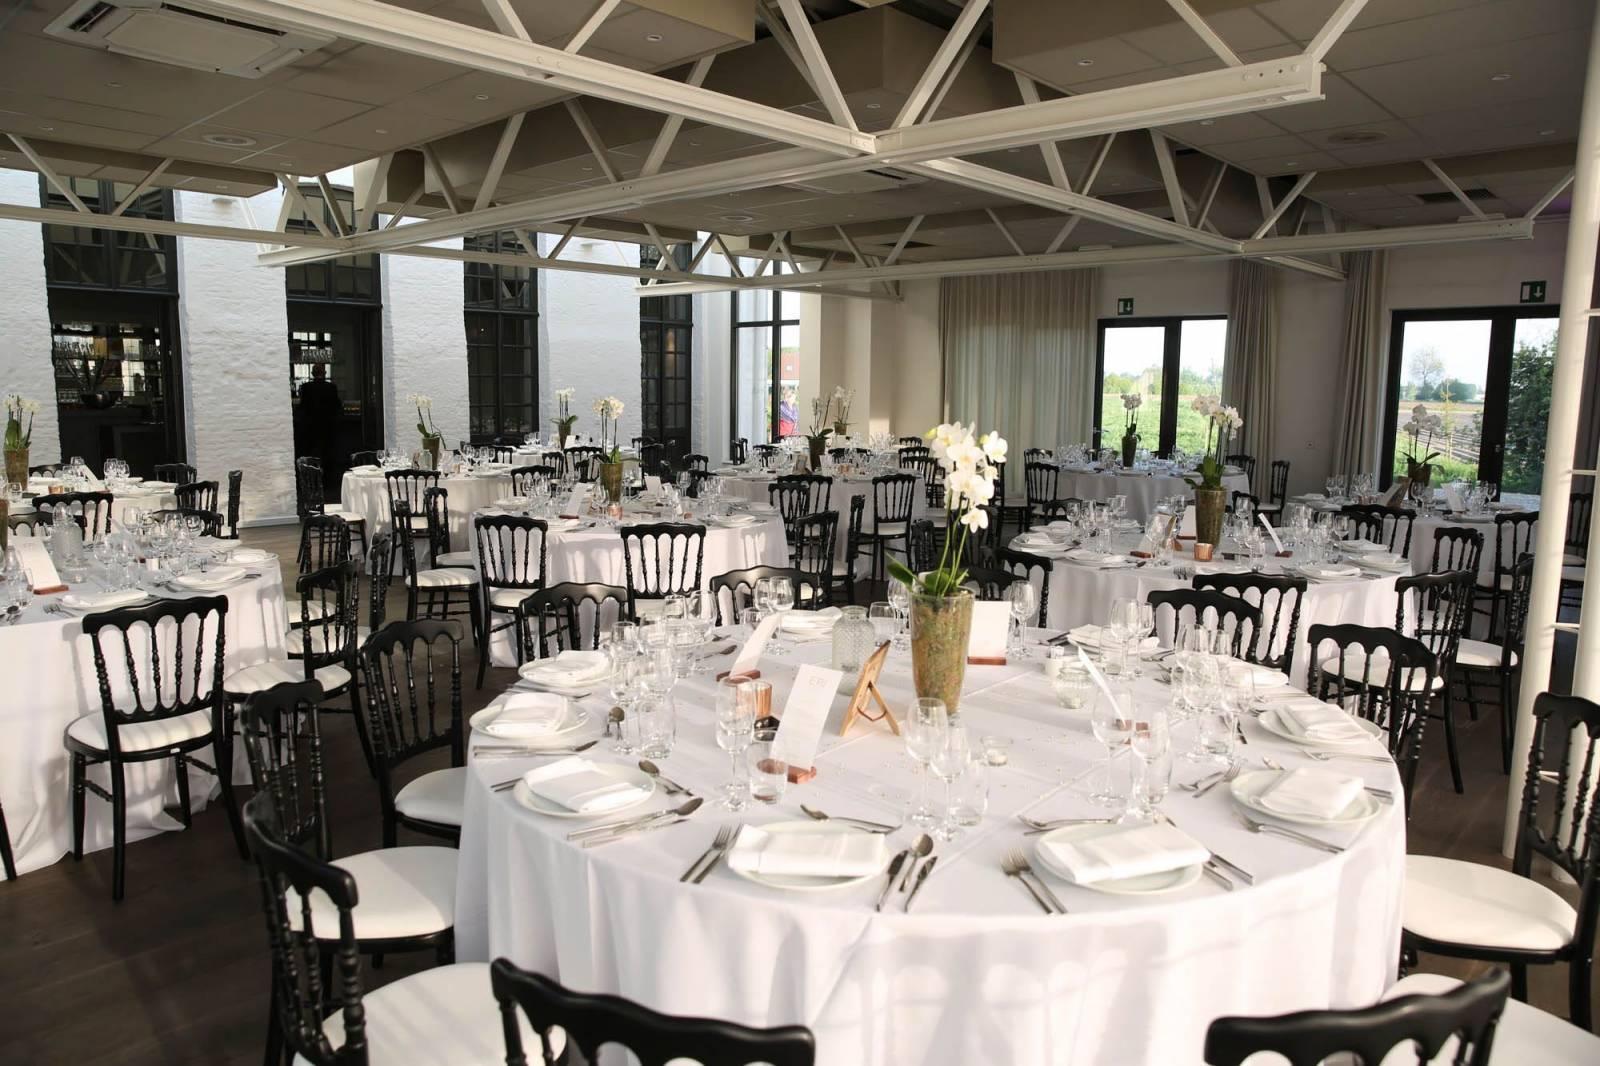 Lamont Ceremonie - Ceremonie - Fotograaf Fotografie Decleck Mario - House of Weddings - 3